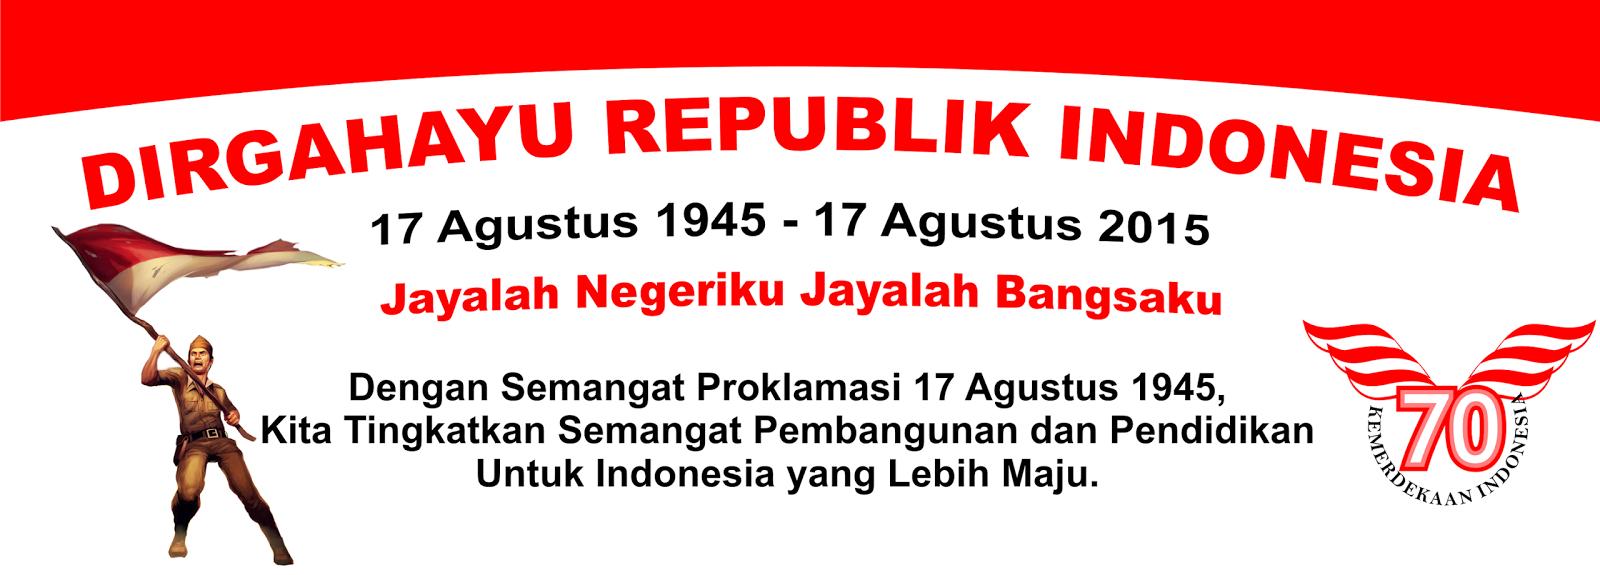 Contoh Desain Spanduk HUT Kemerdekaan Indonesia Ke 70